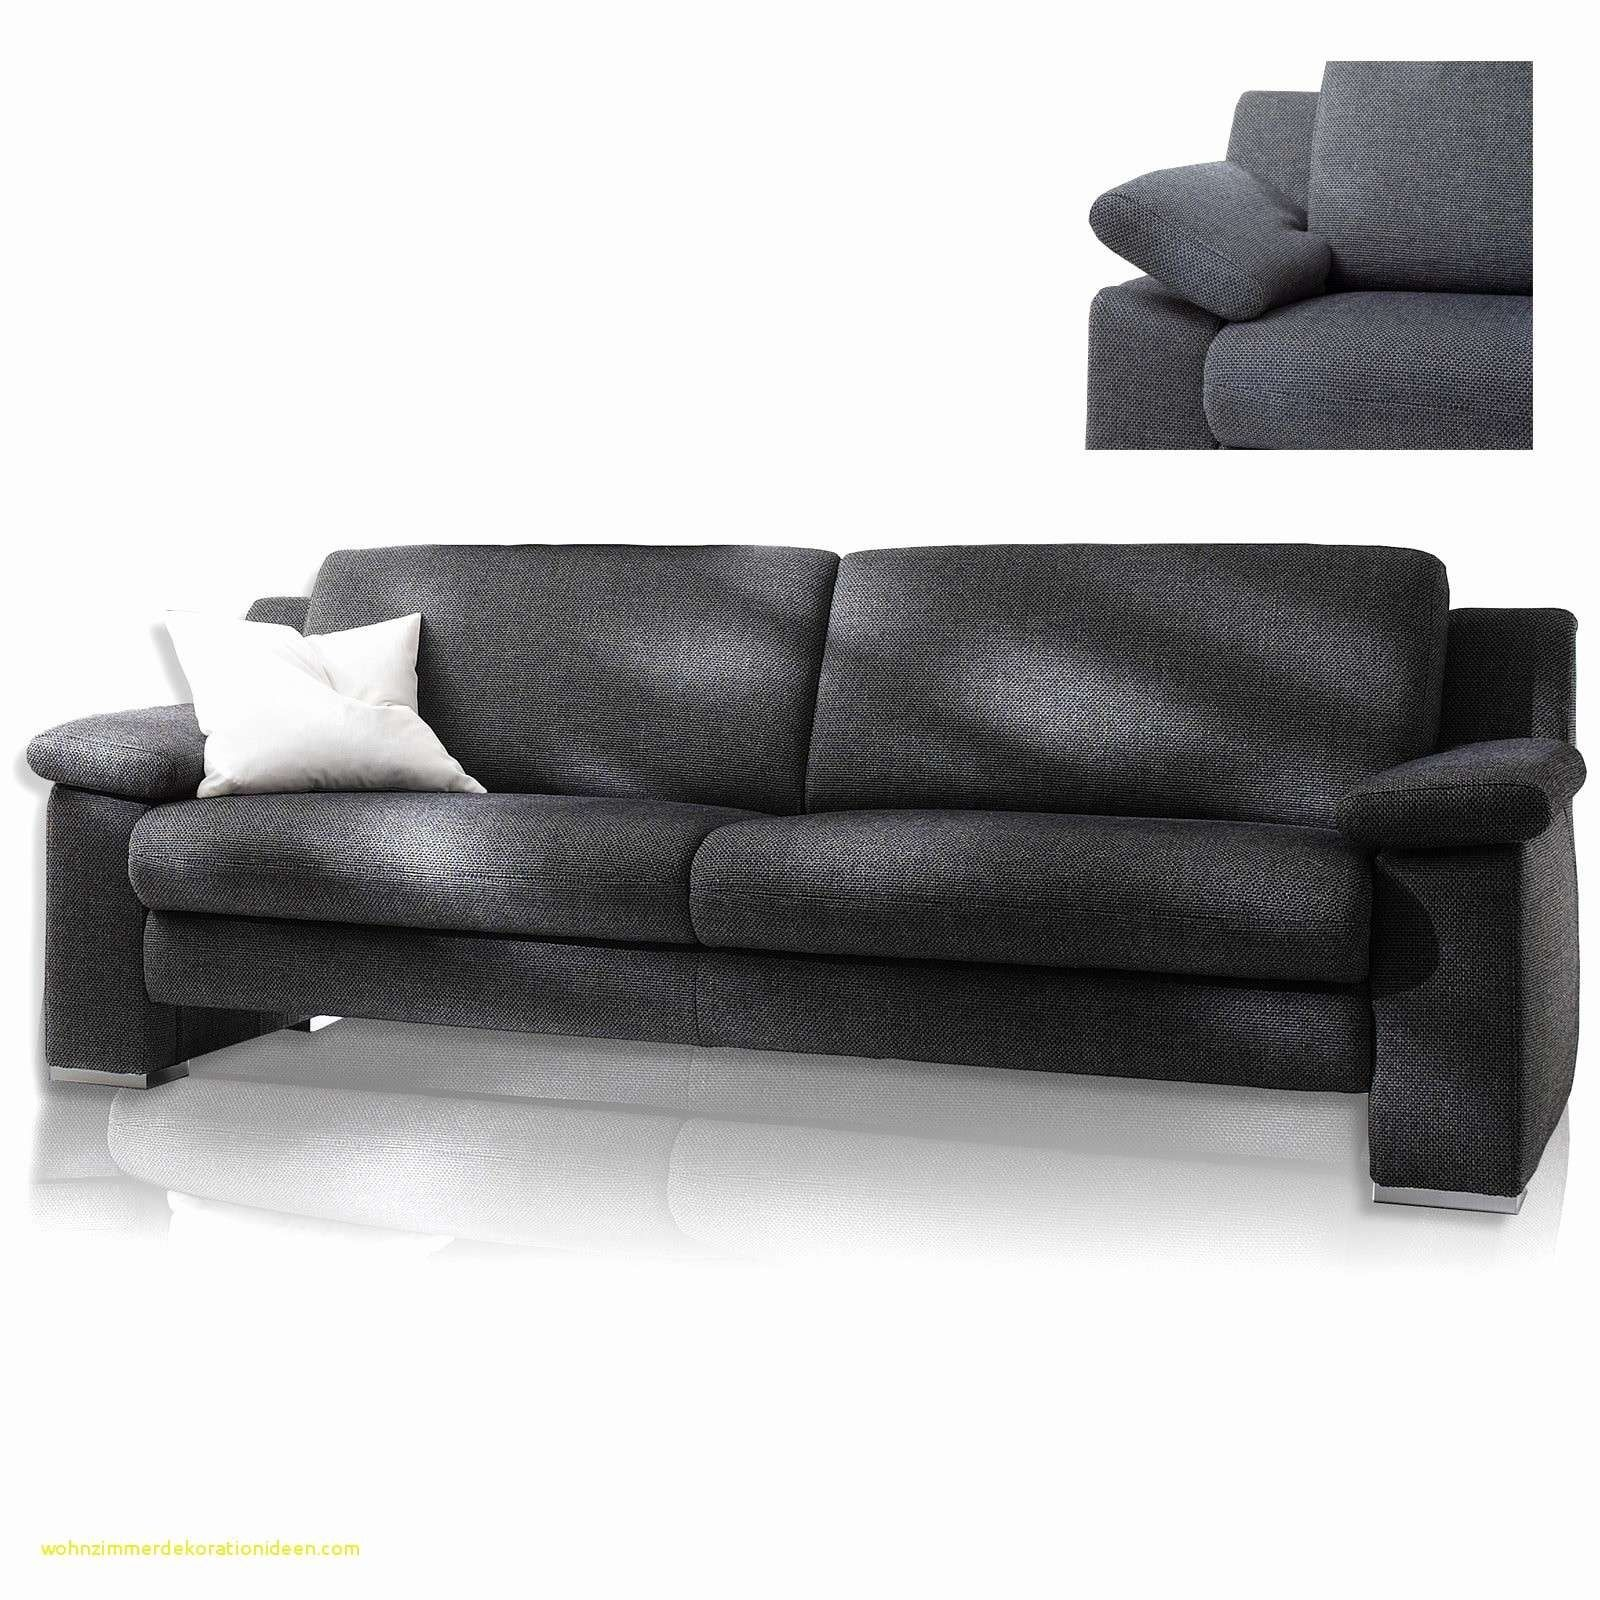 Poco Garnitur Big Sofas Sofa Modern Couch